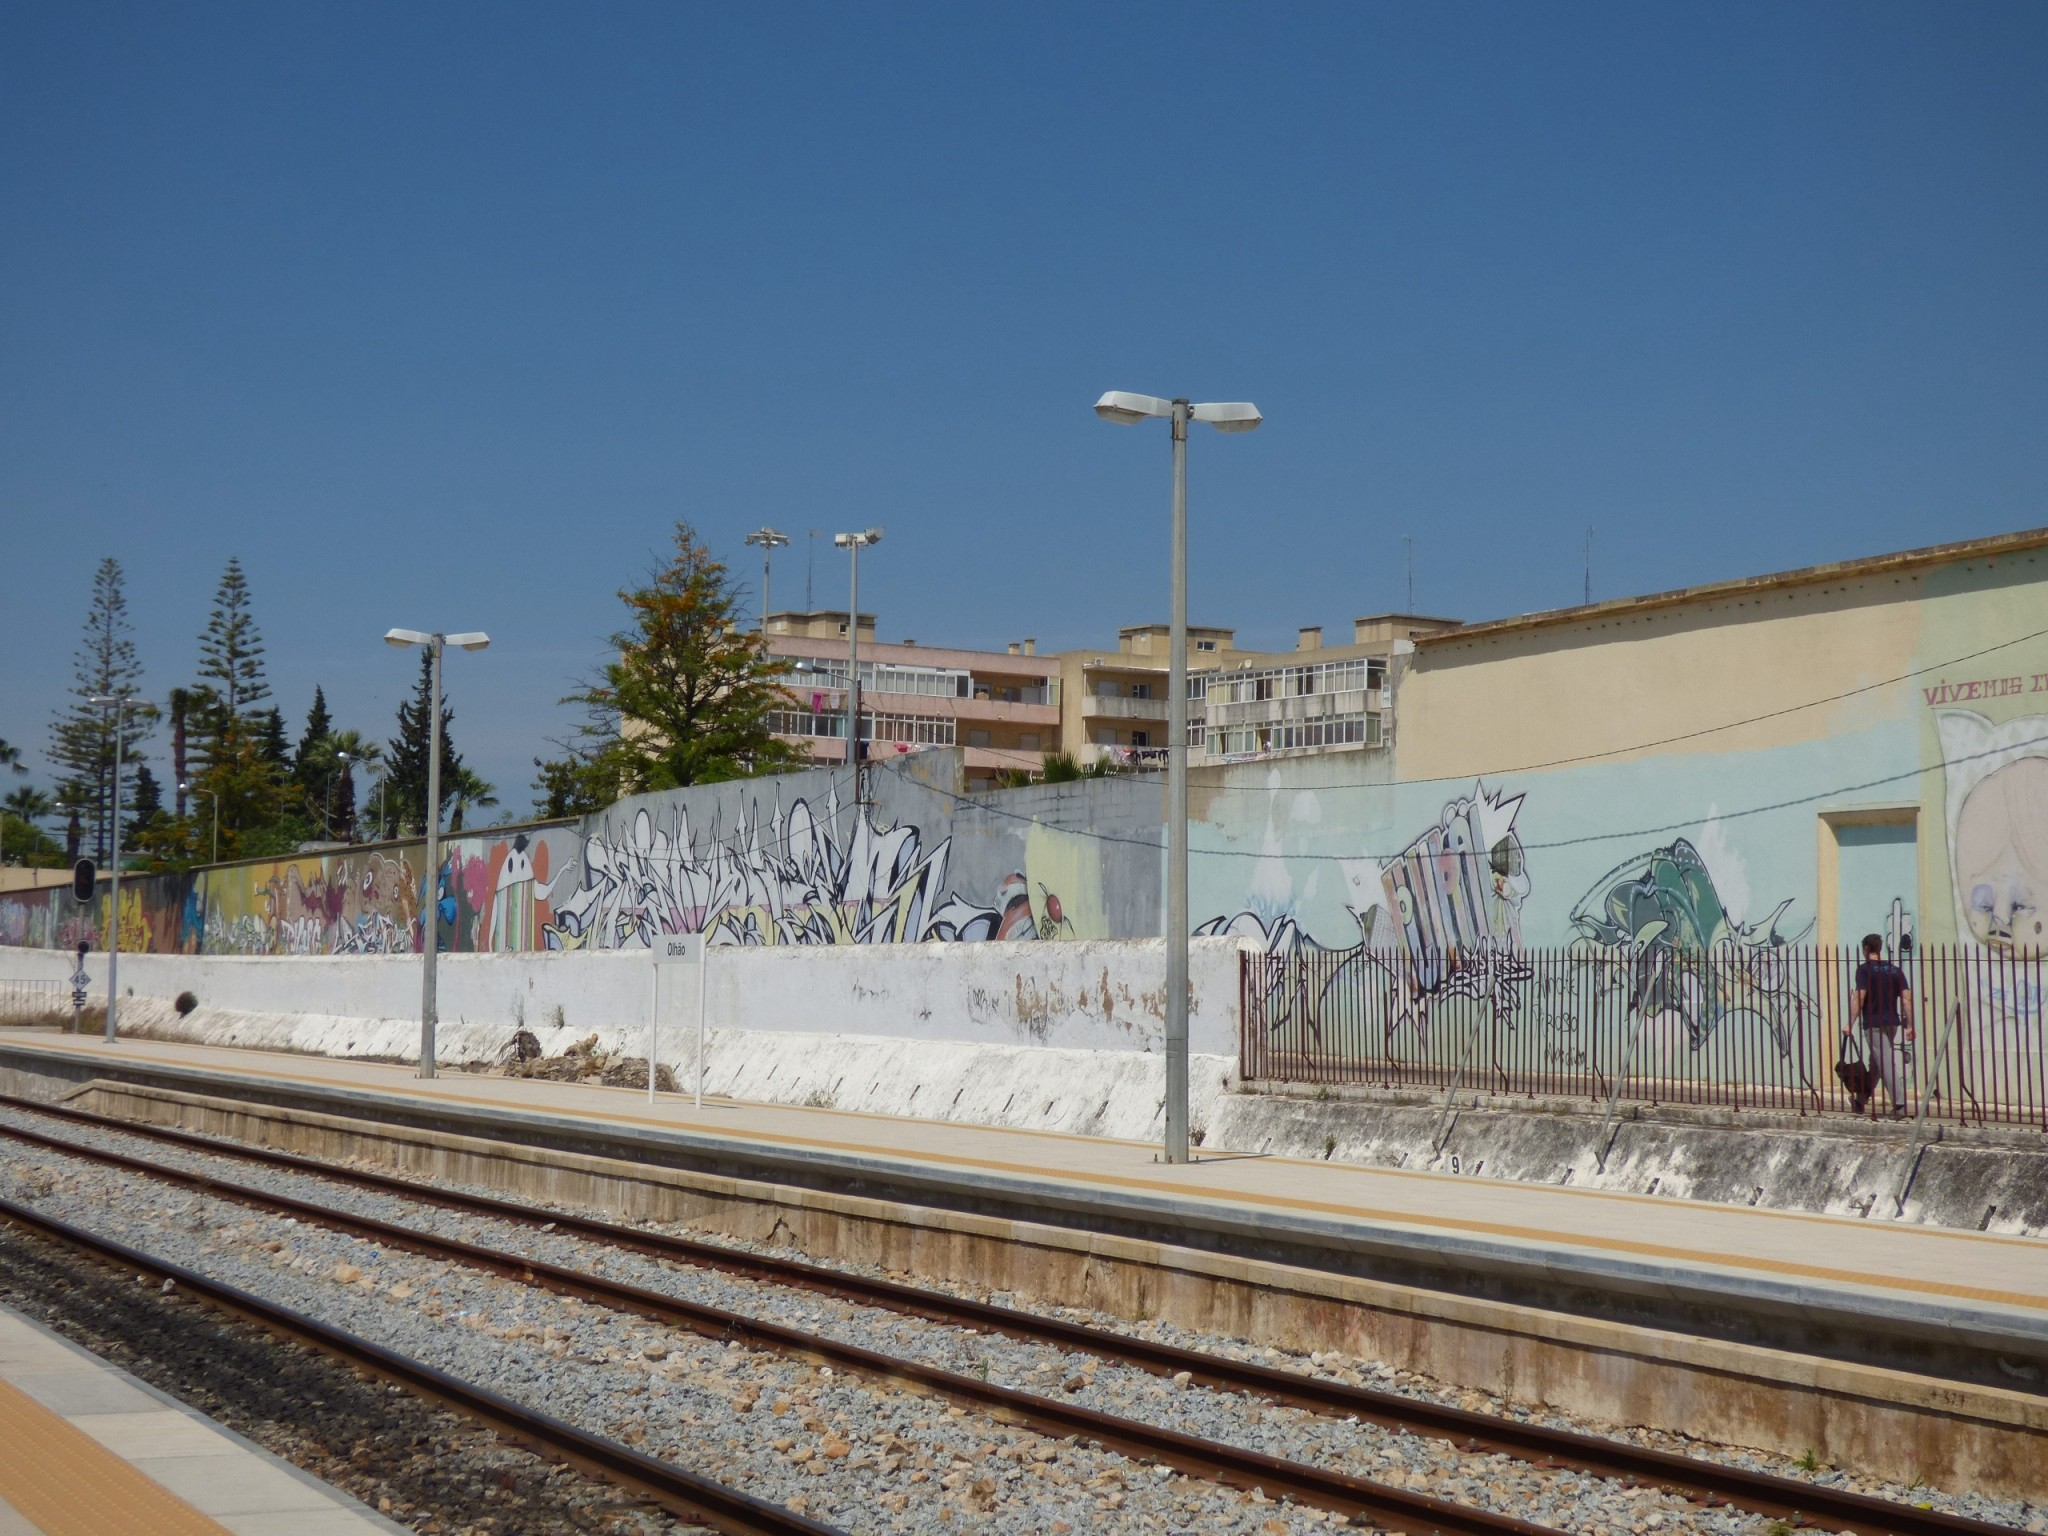 Olhao juna-asema Algarve